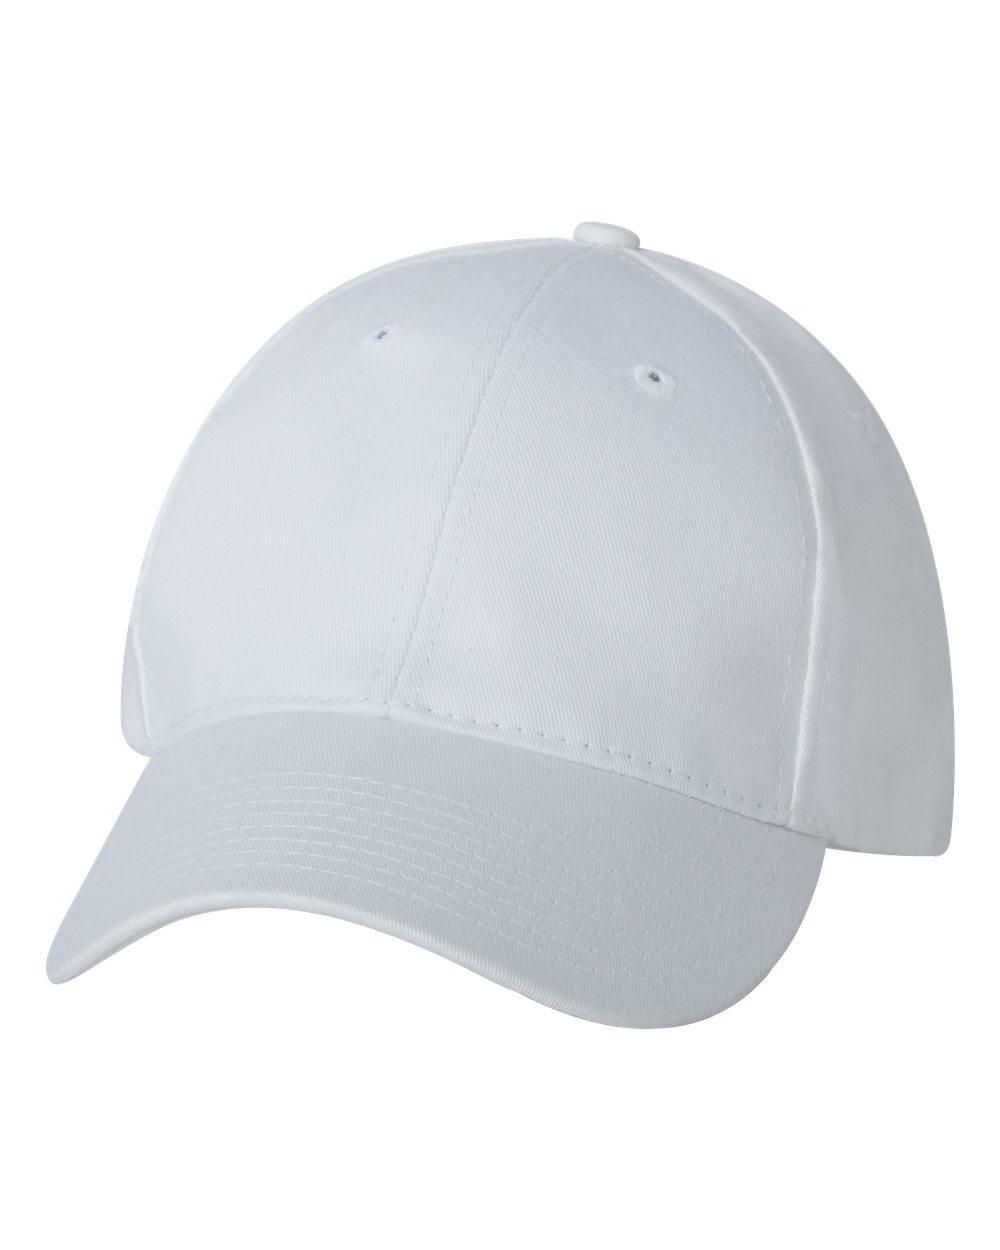 Bayside-Mens-Baseball-USA-Made-Structured-Cap-Hat-3660-six-panel-mid-profile thumbnail 15